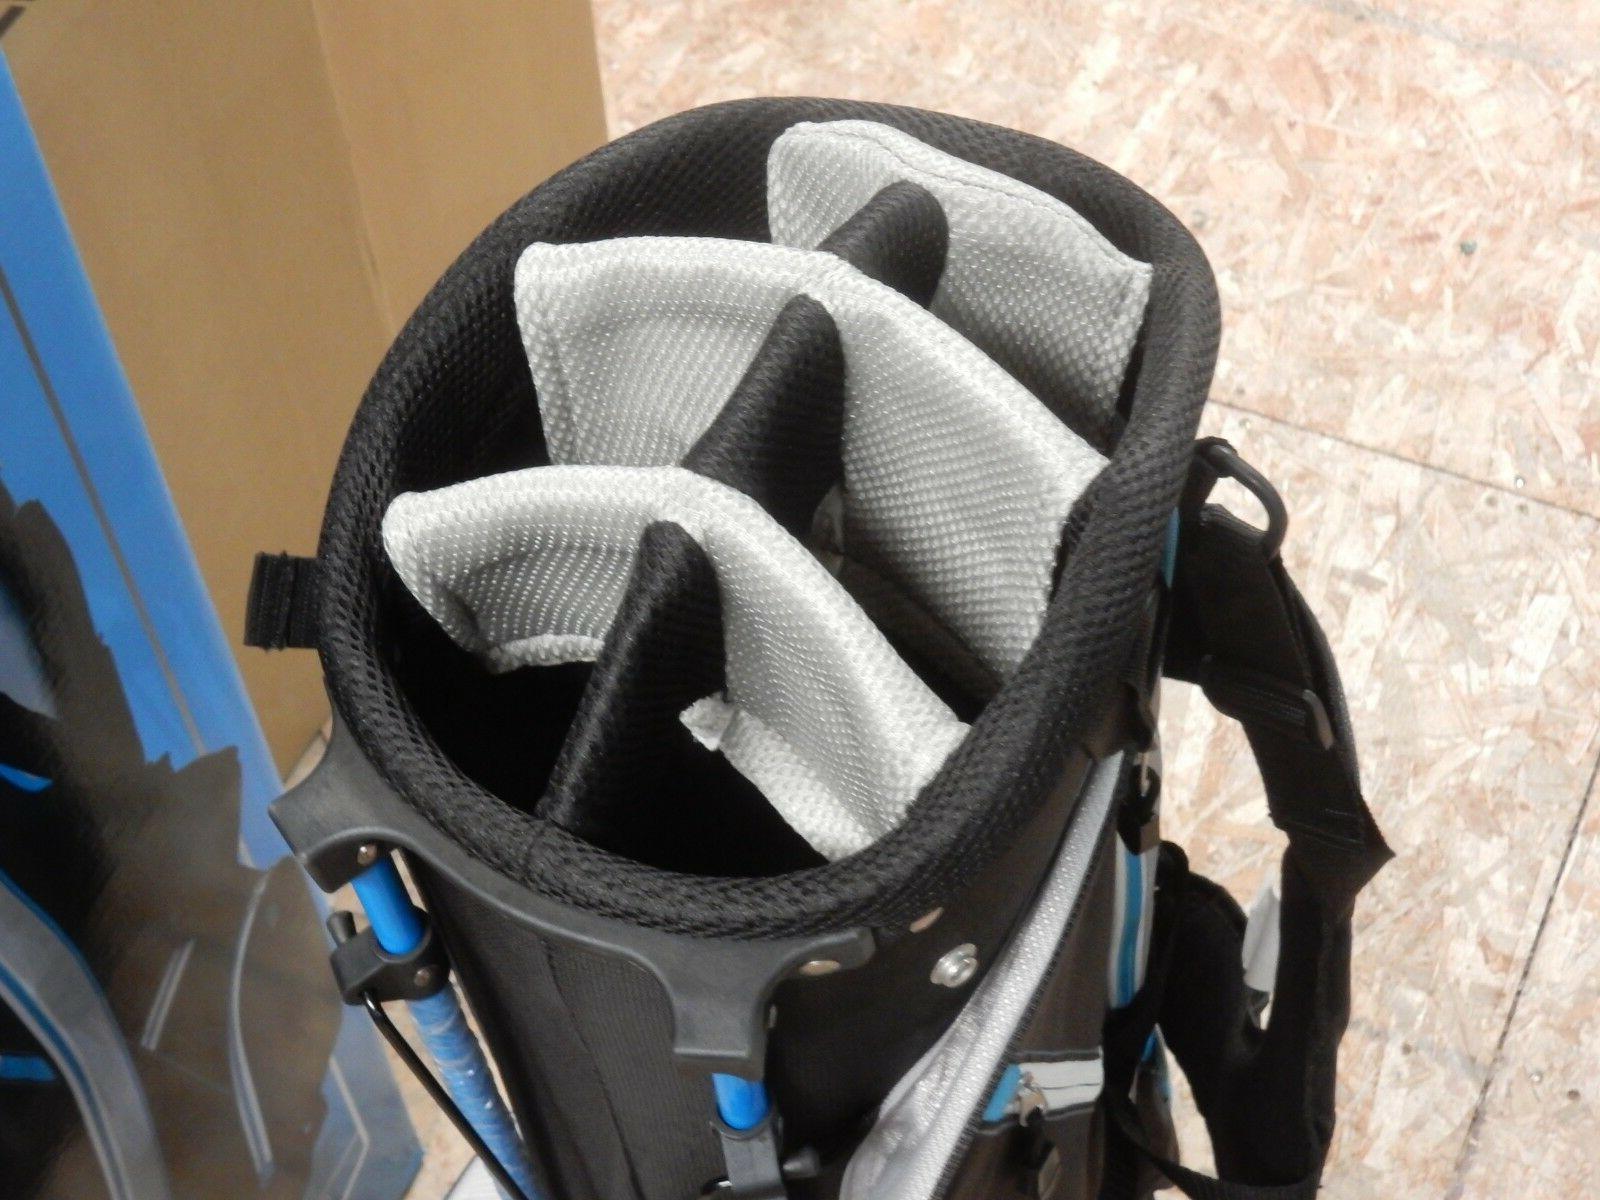 Strata Carry Golf Bag 7-Way Divider Hood #65209